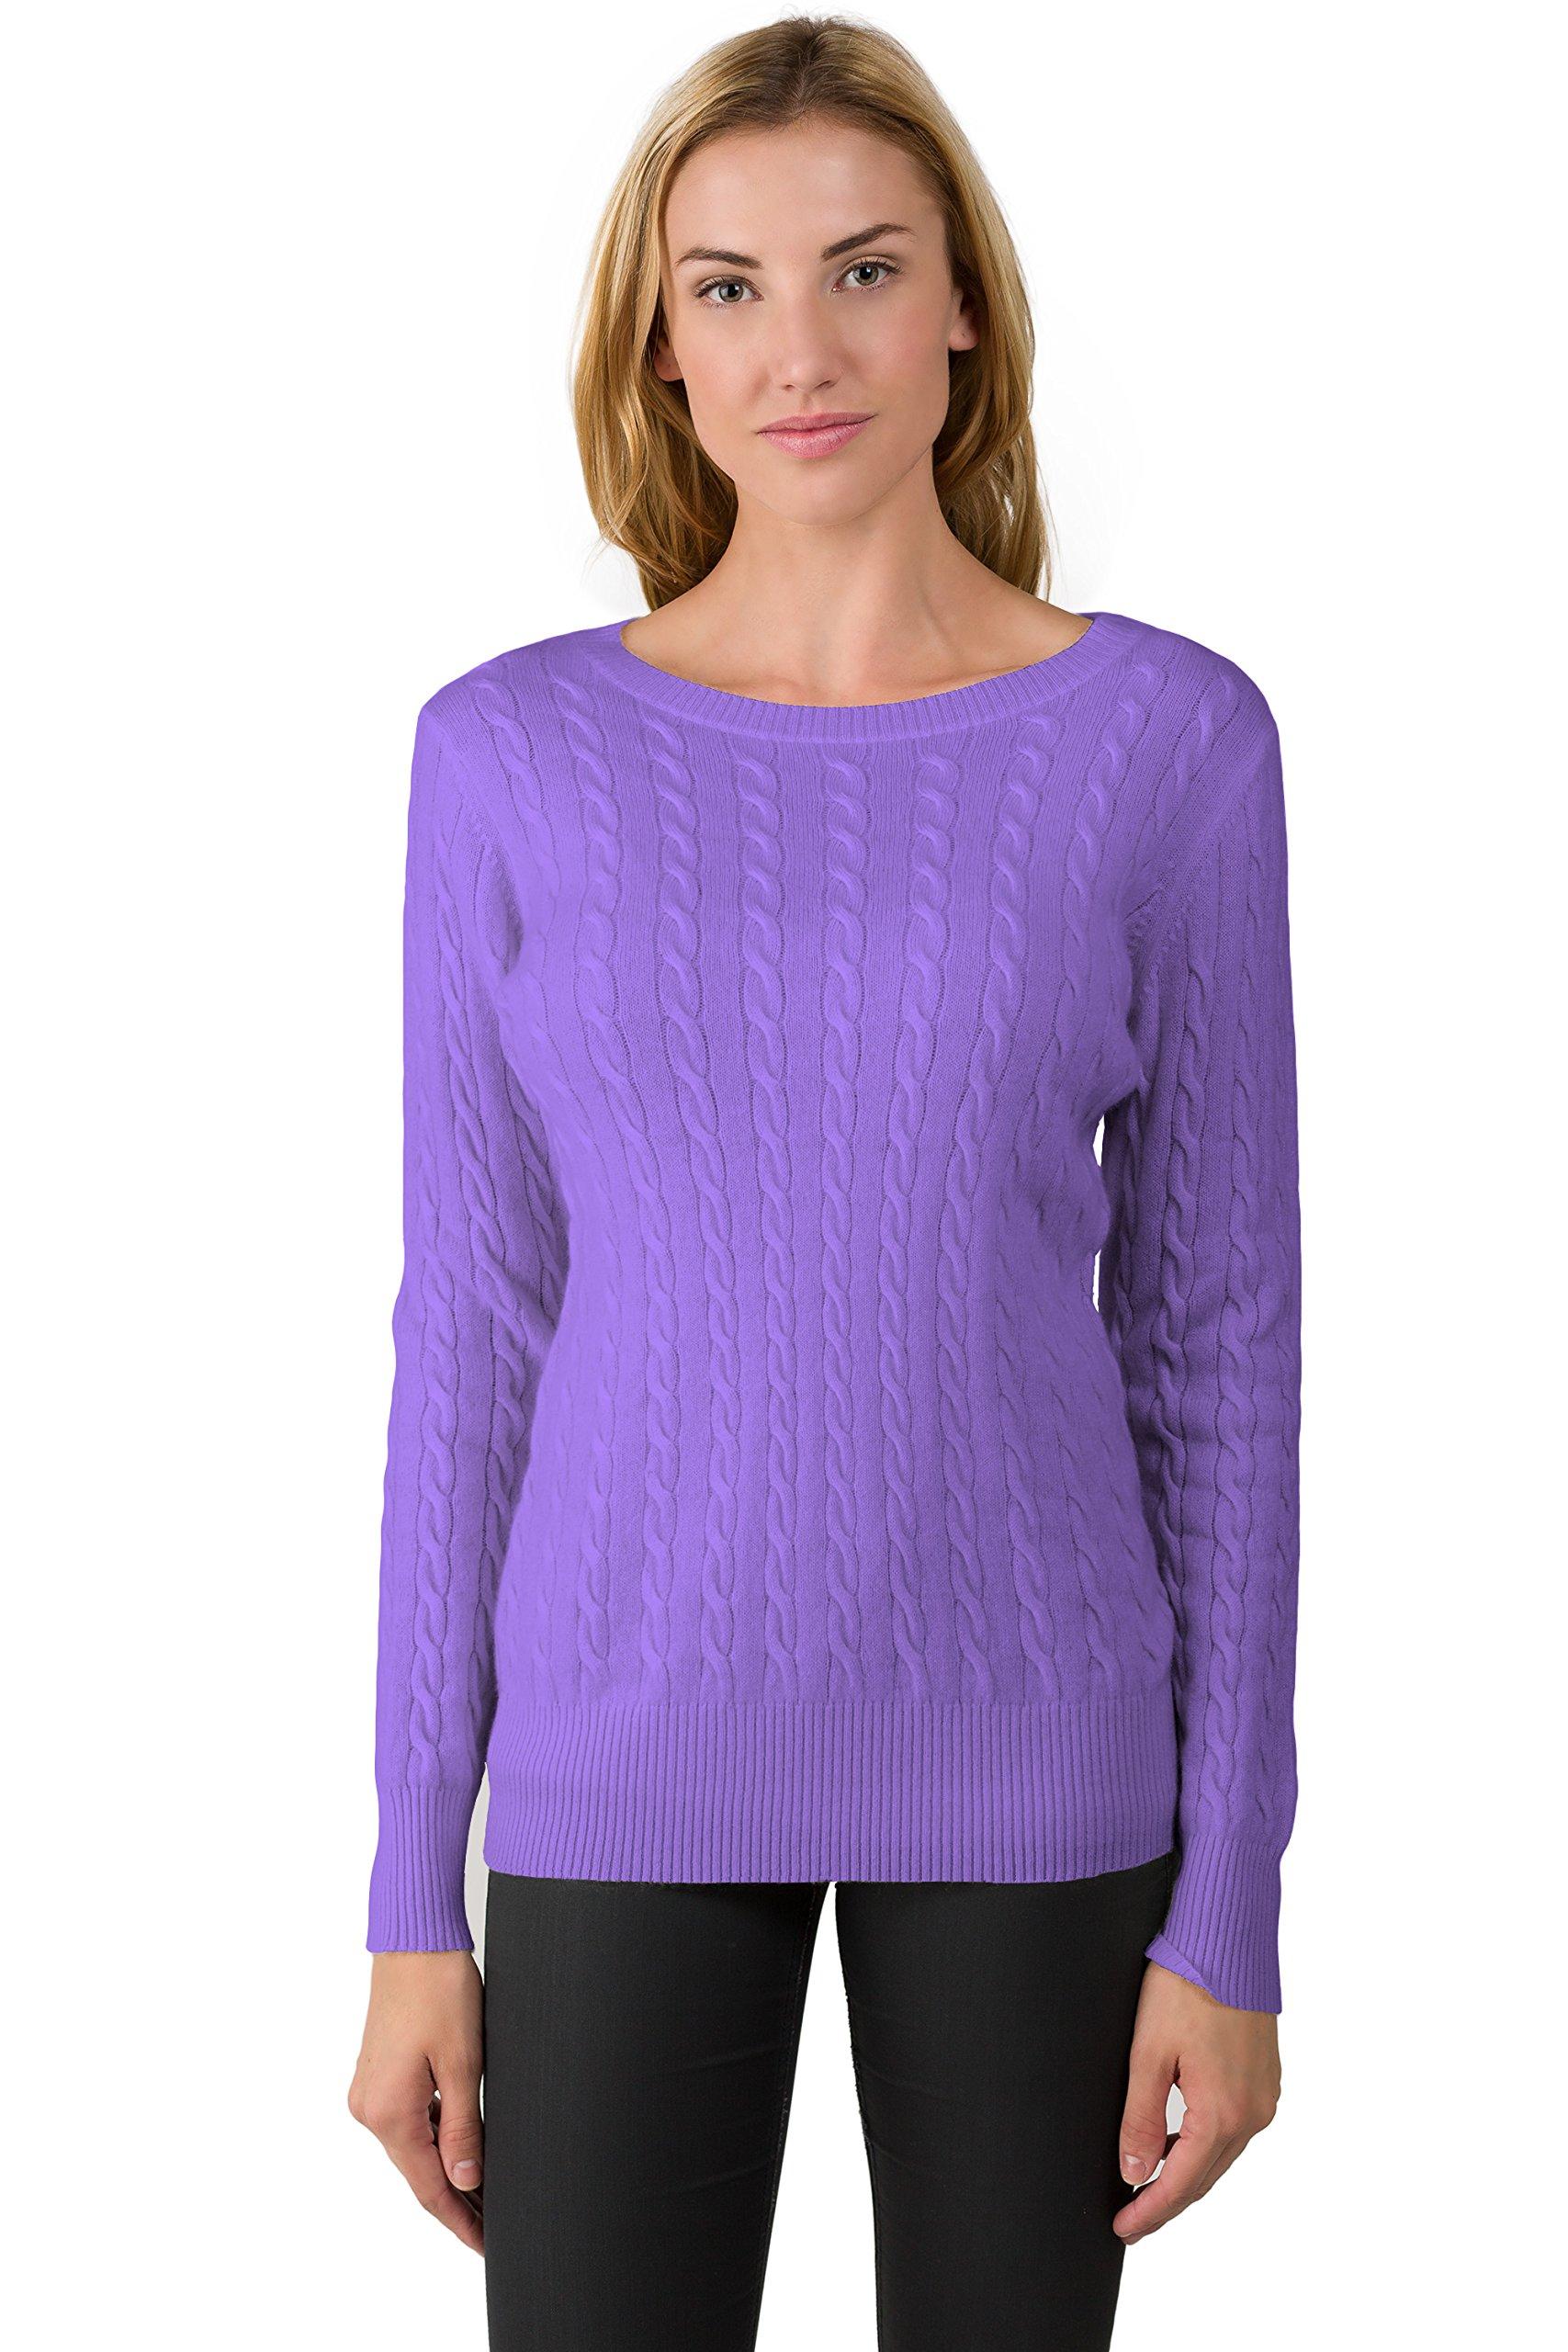 J CASHMERE Women's 100% Cashmere Long Sleeve Pullover Cable Crewneck Sweater (S, Lavender)